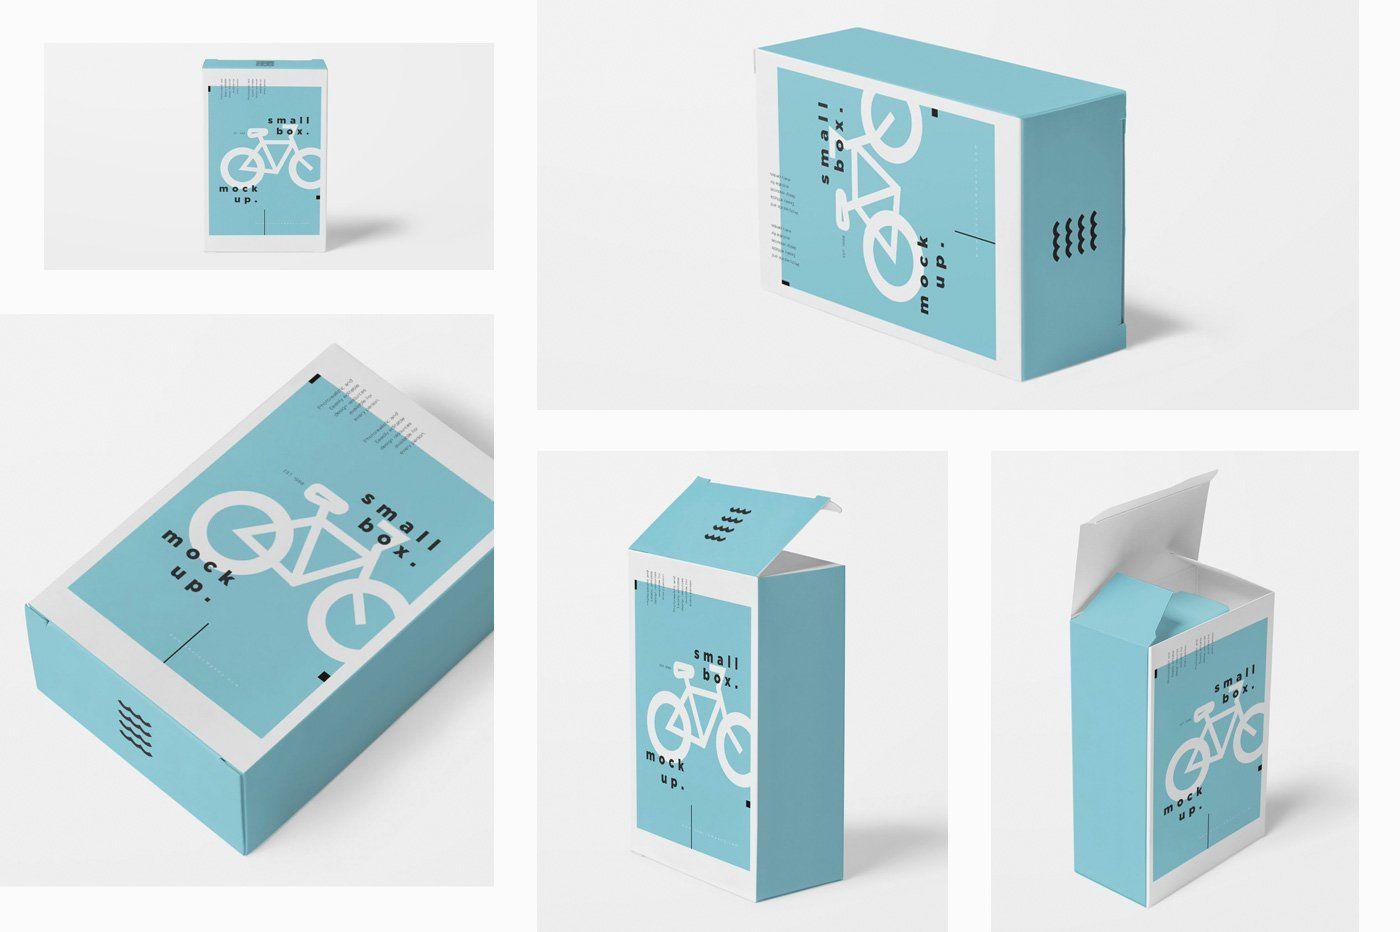 Download Small Cardboard Box Mockups Cardboard Box Box Mockup Soap Boxes